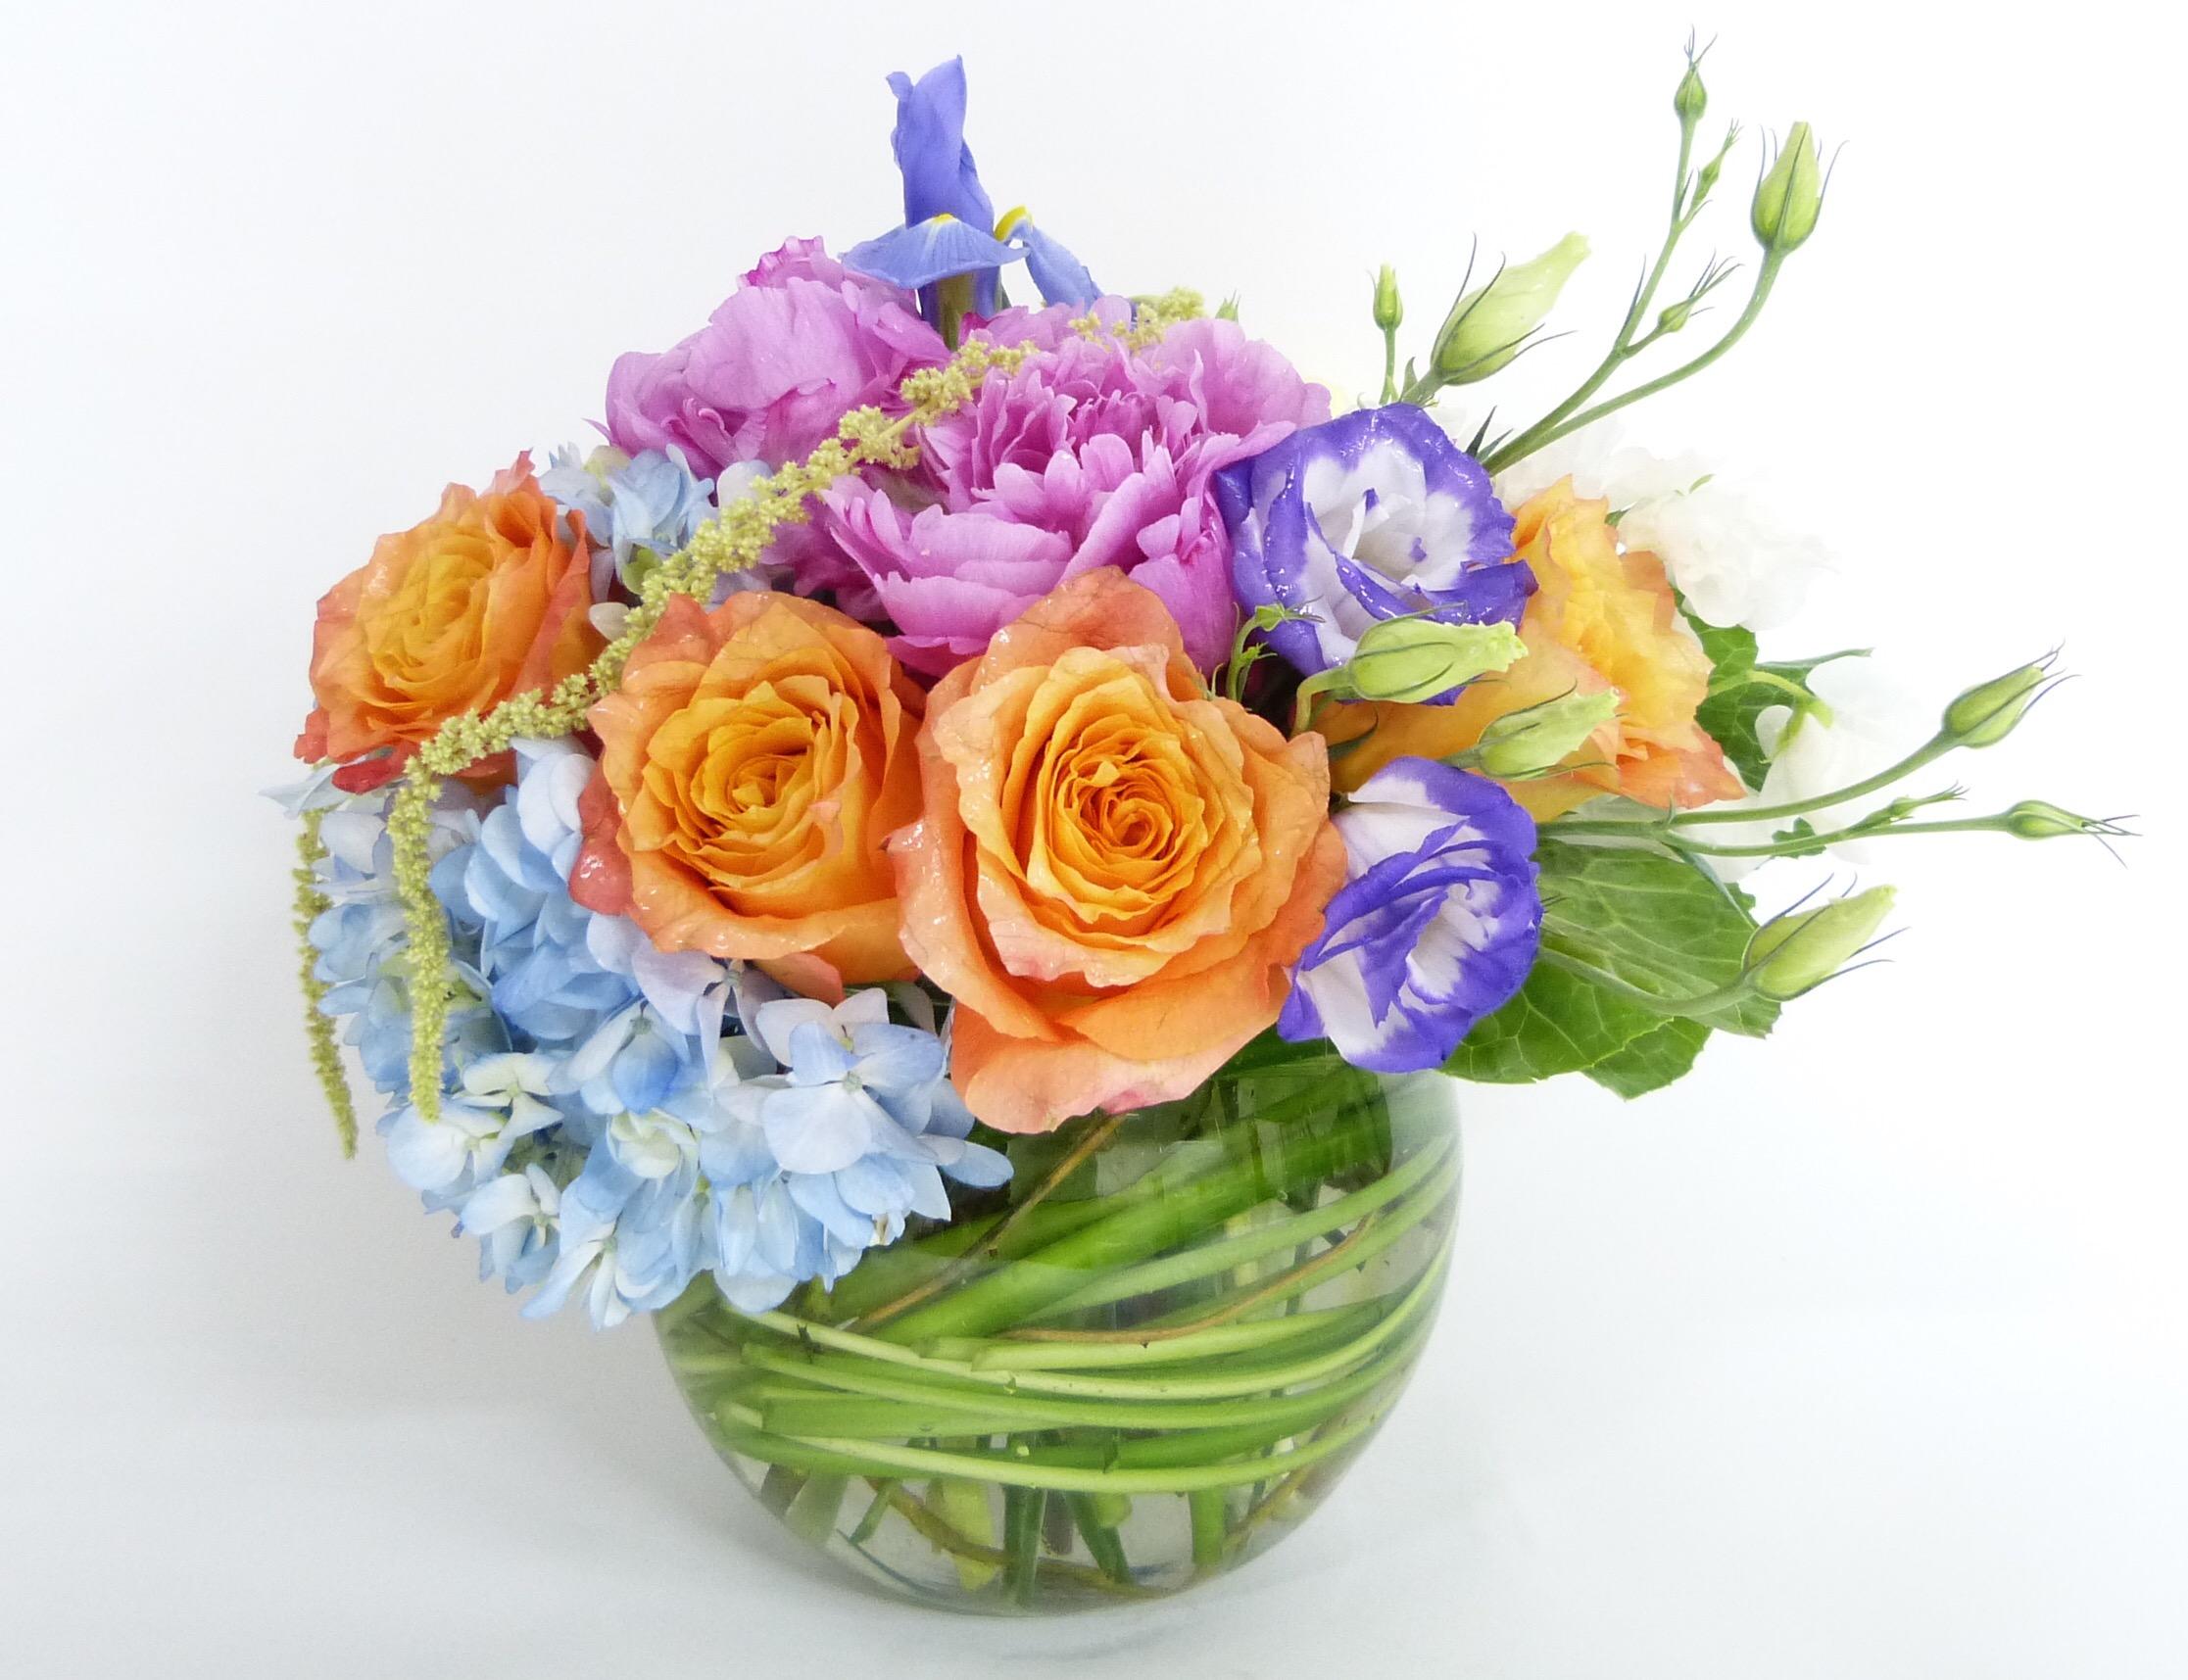 Simply Stunning Bell Flowers Blog